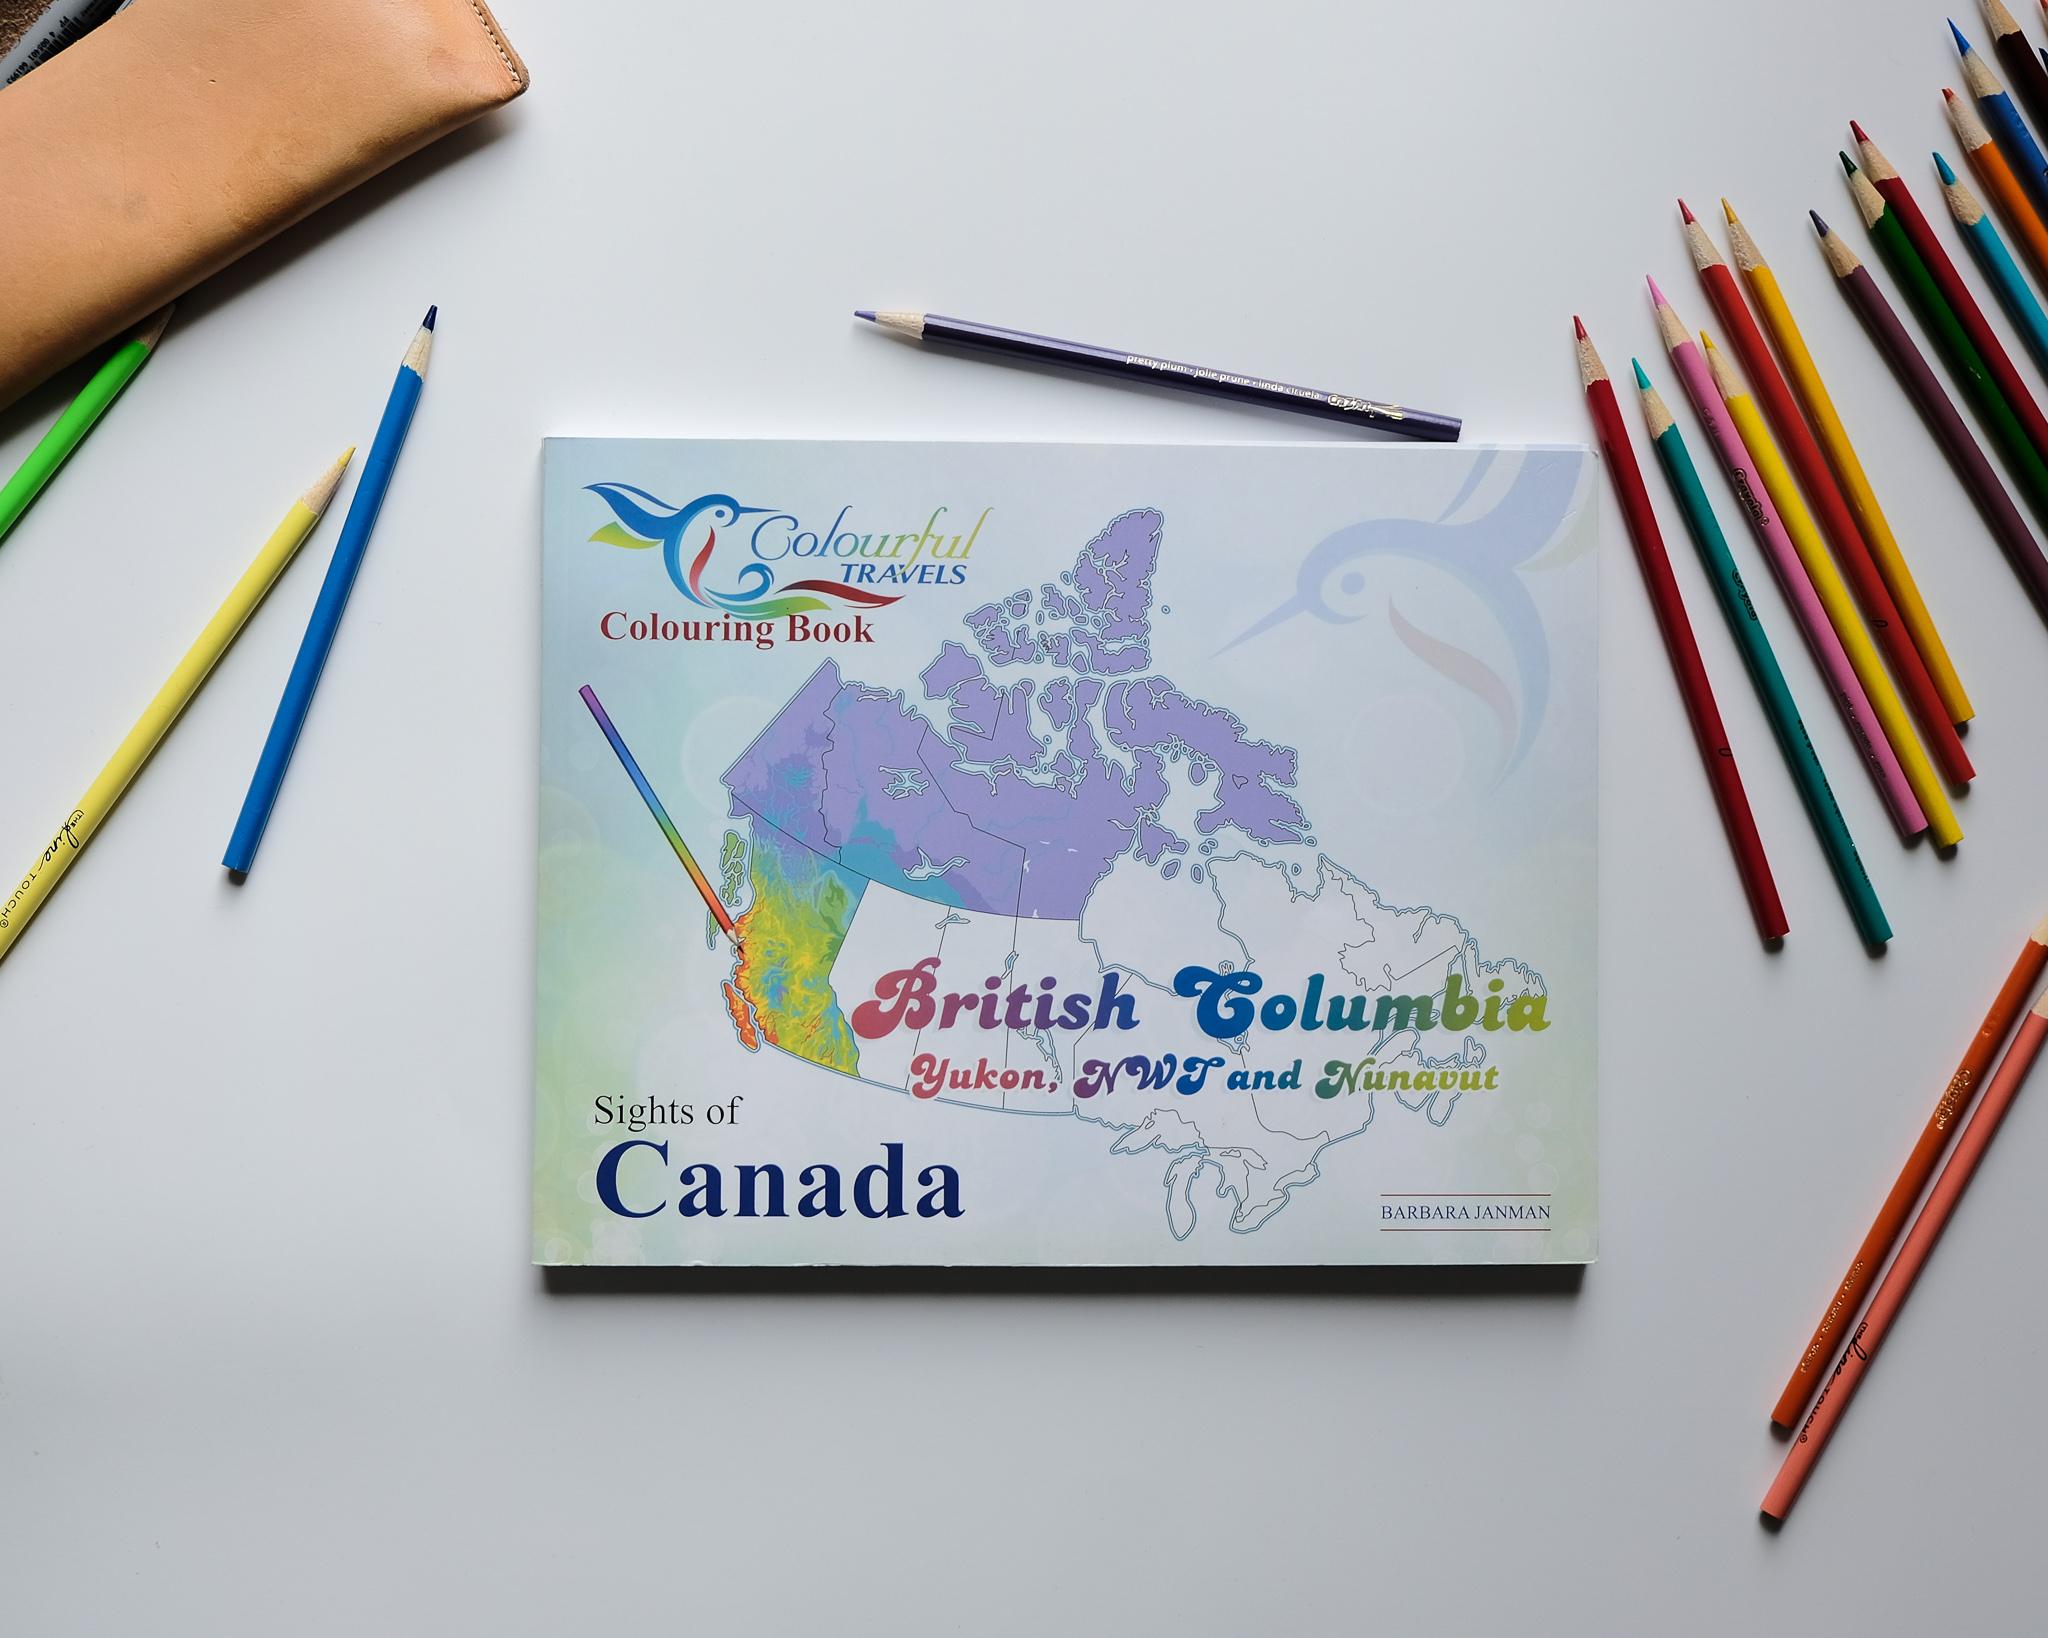 British Columbia - Sights of Canada